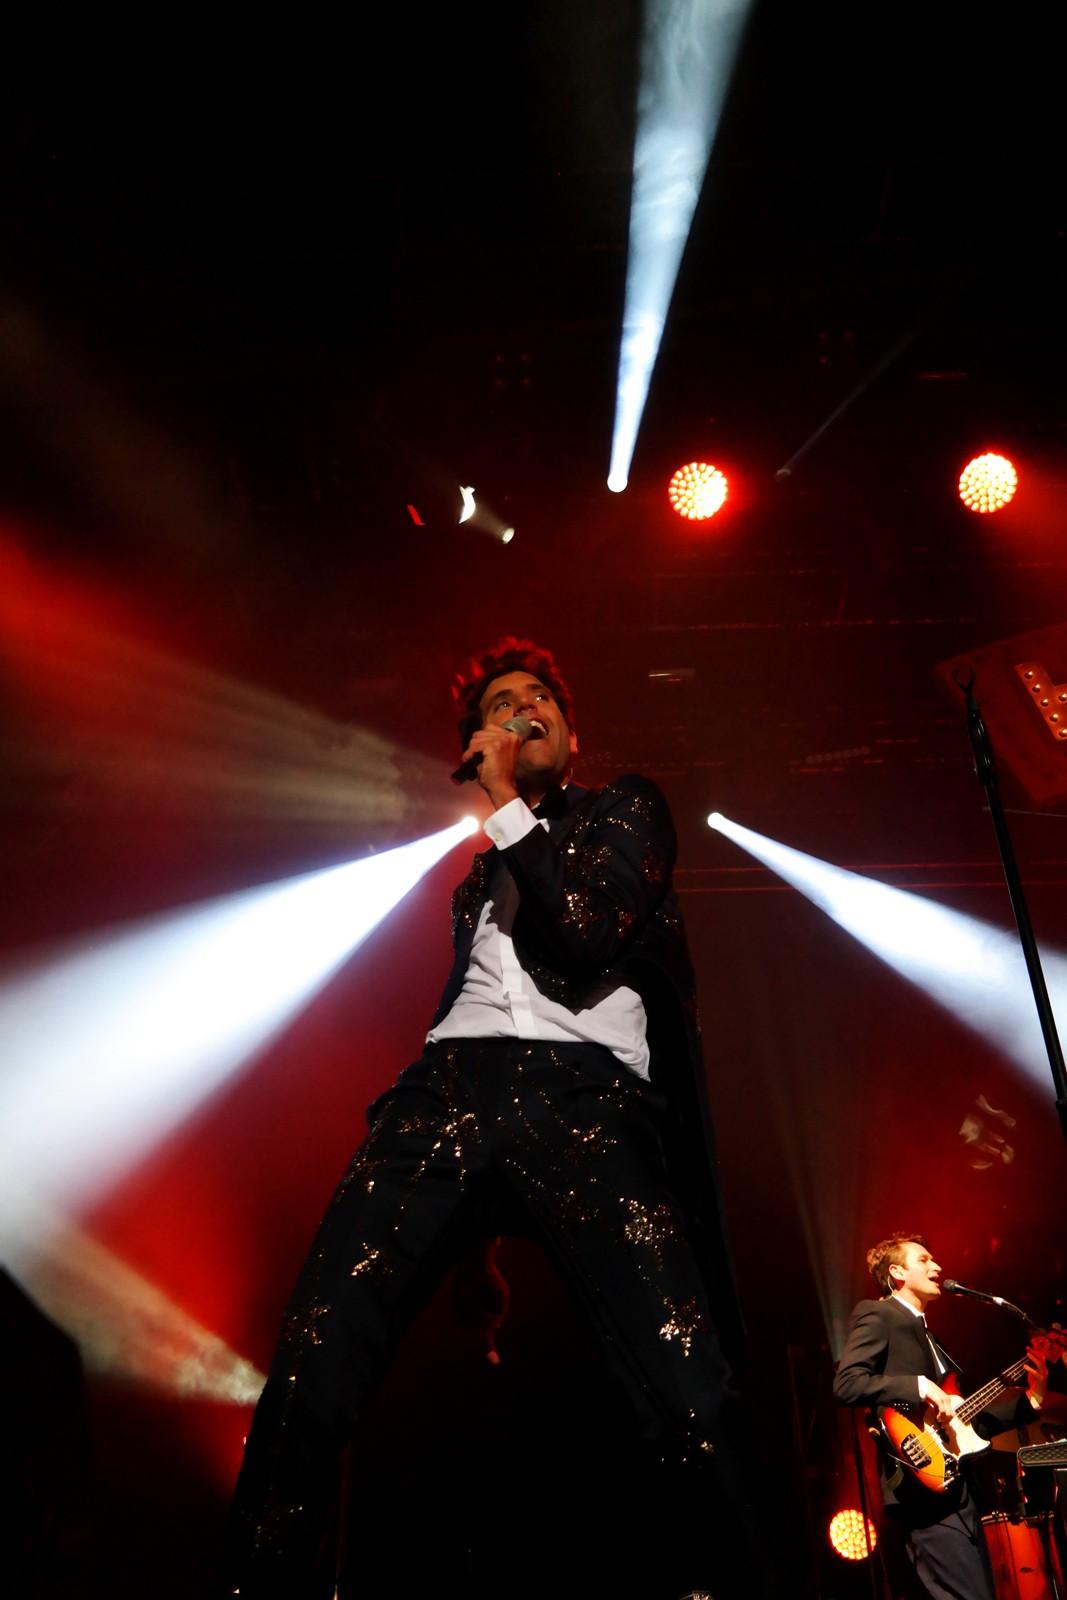 Mika live concert Printemps de Bourges 2016 festival music stage photo by united states of paris blog